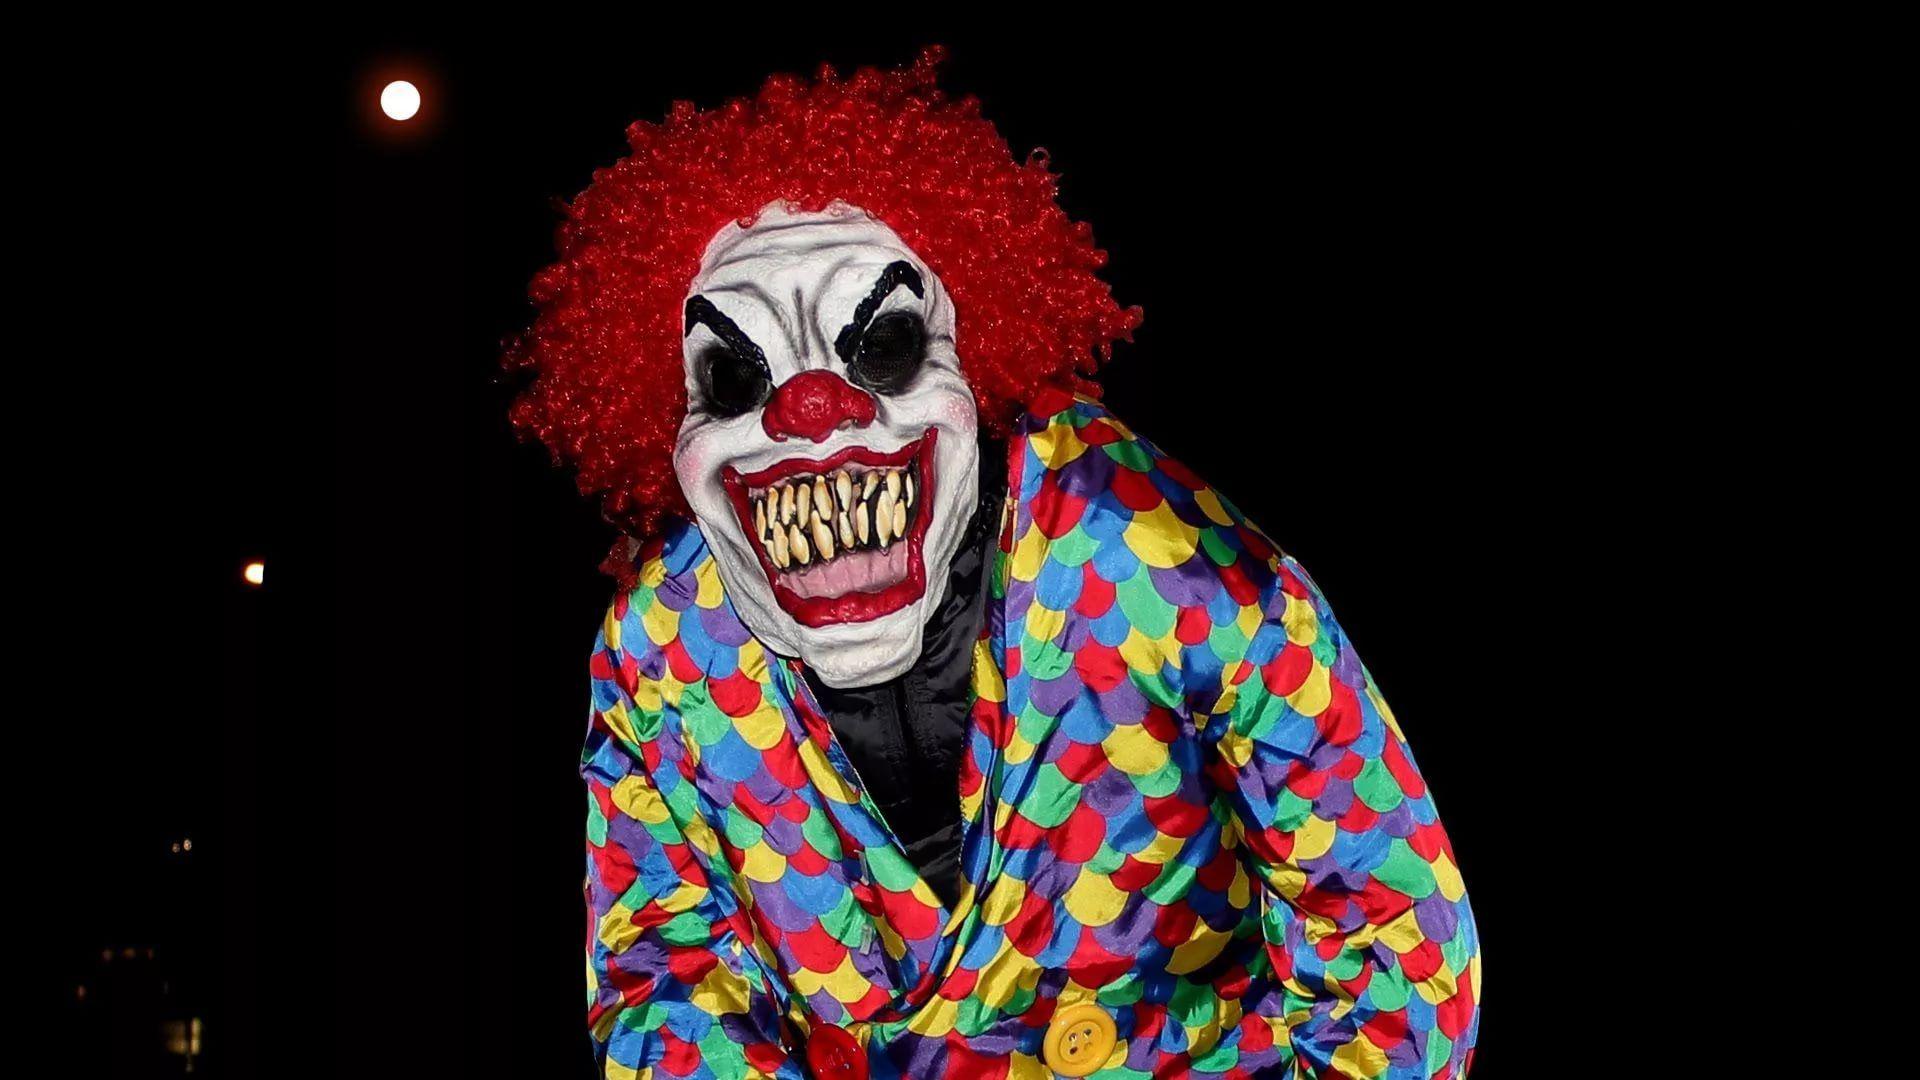 Killer Clown Nice Wallpaper